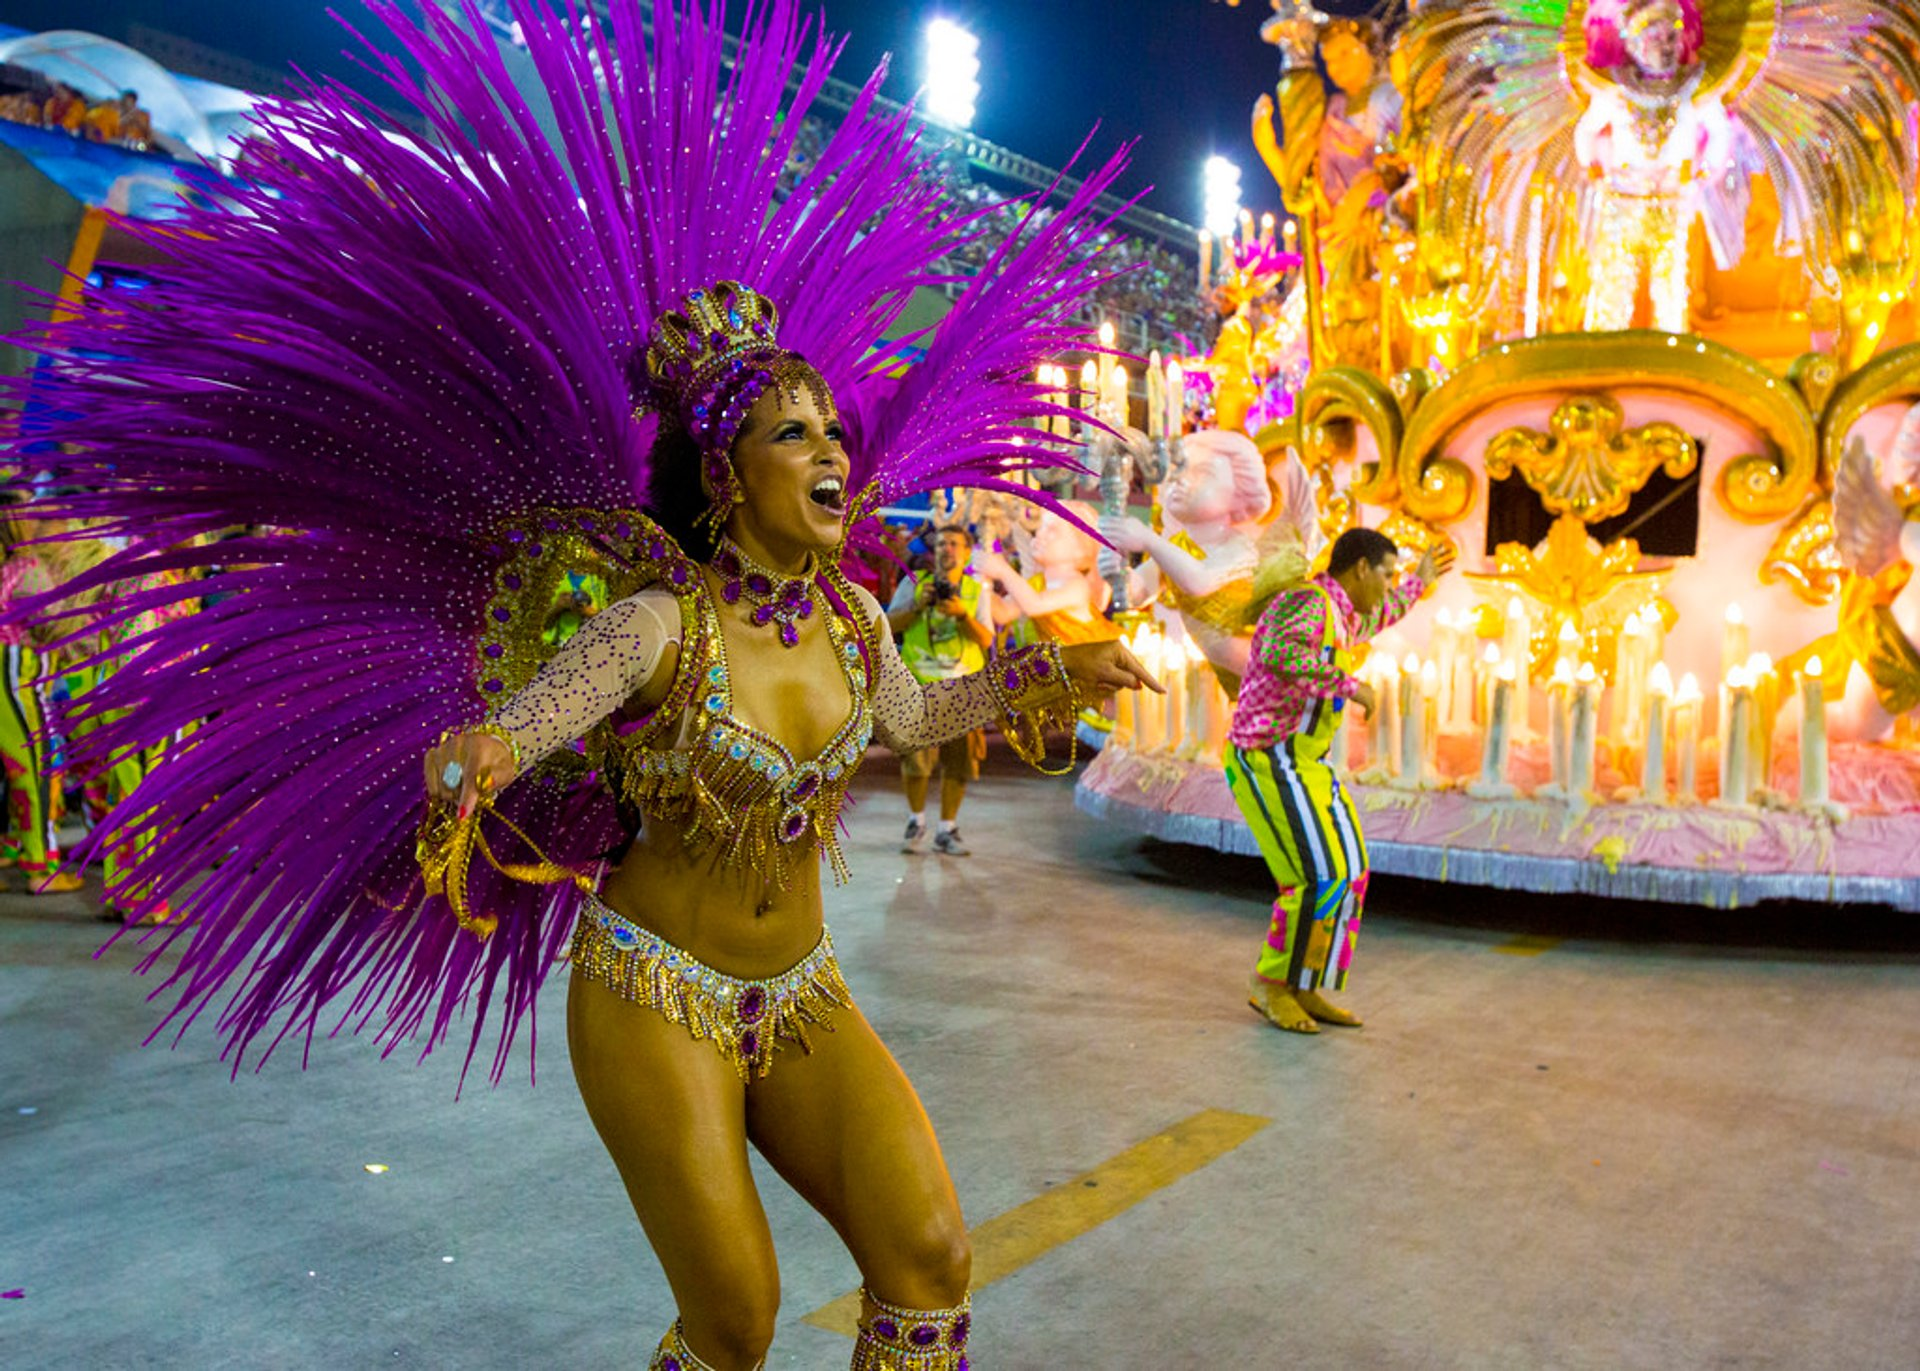 Rio Carnival in Rio de Janeiro - Best Season 2020